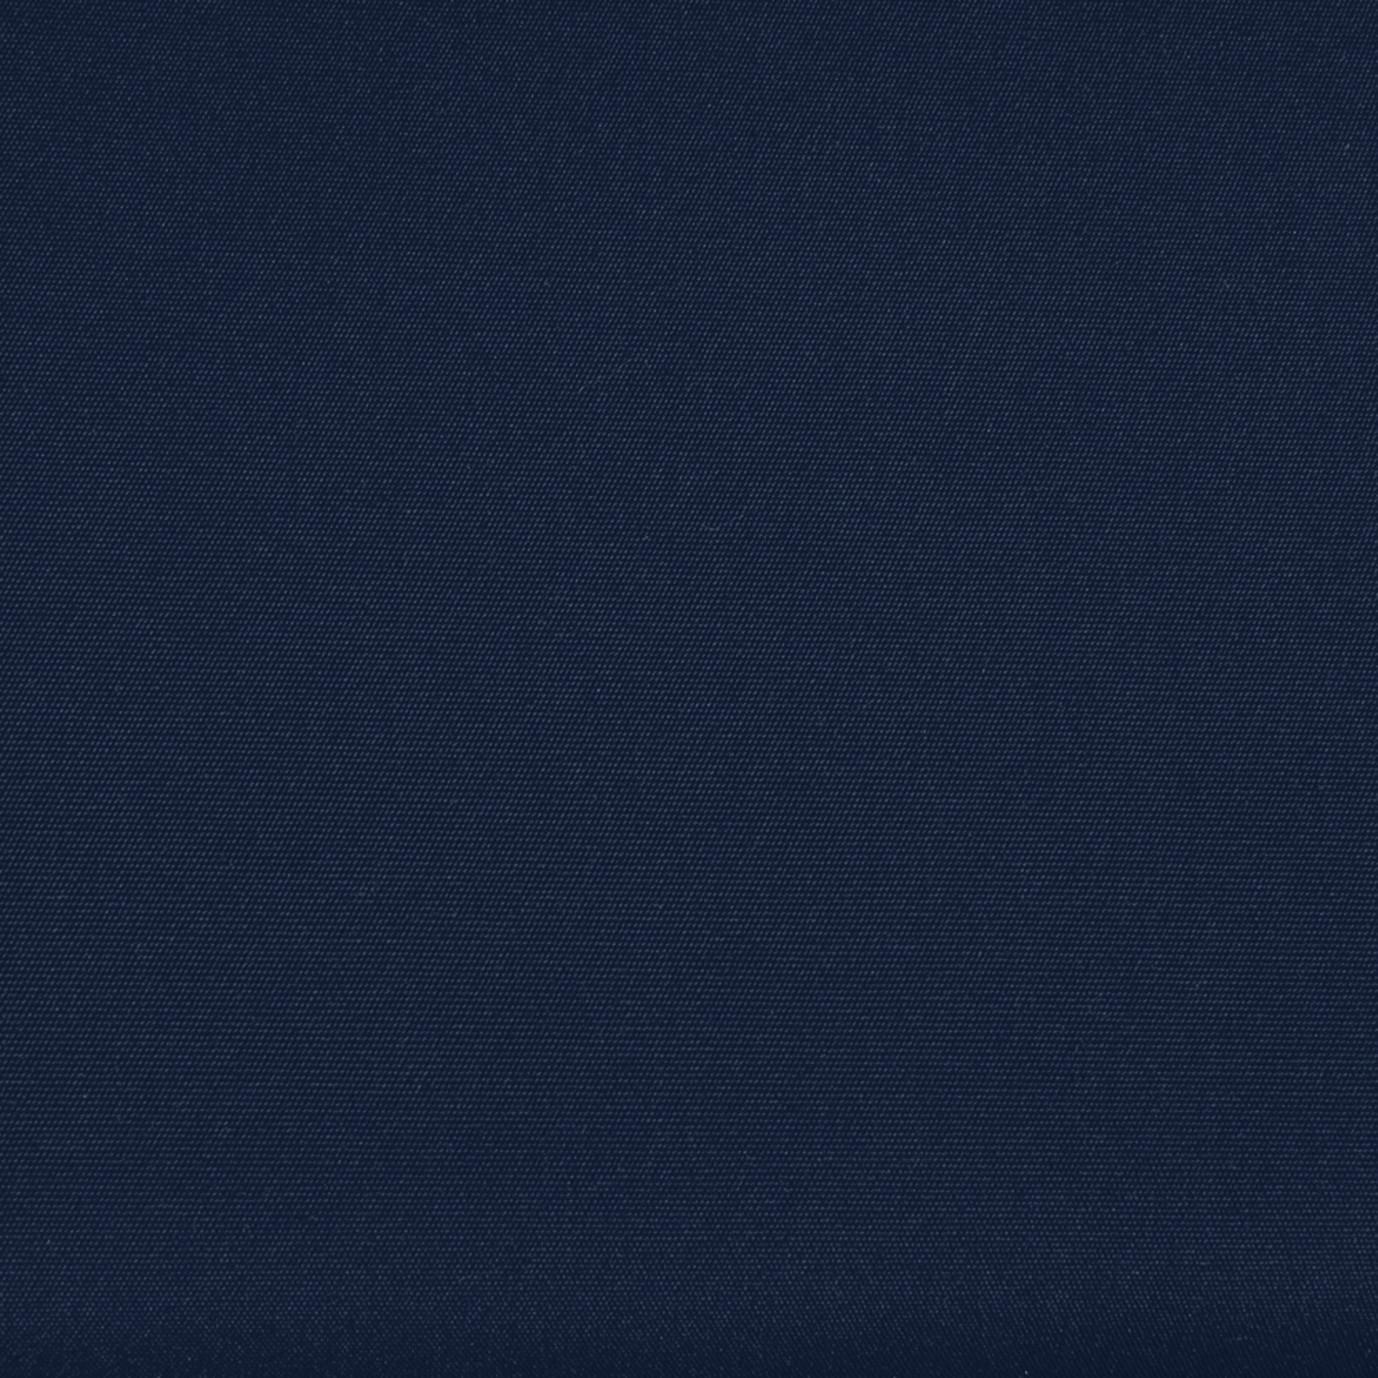 Milo™ Grey Ottomans - Navy Blue